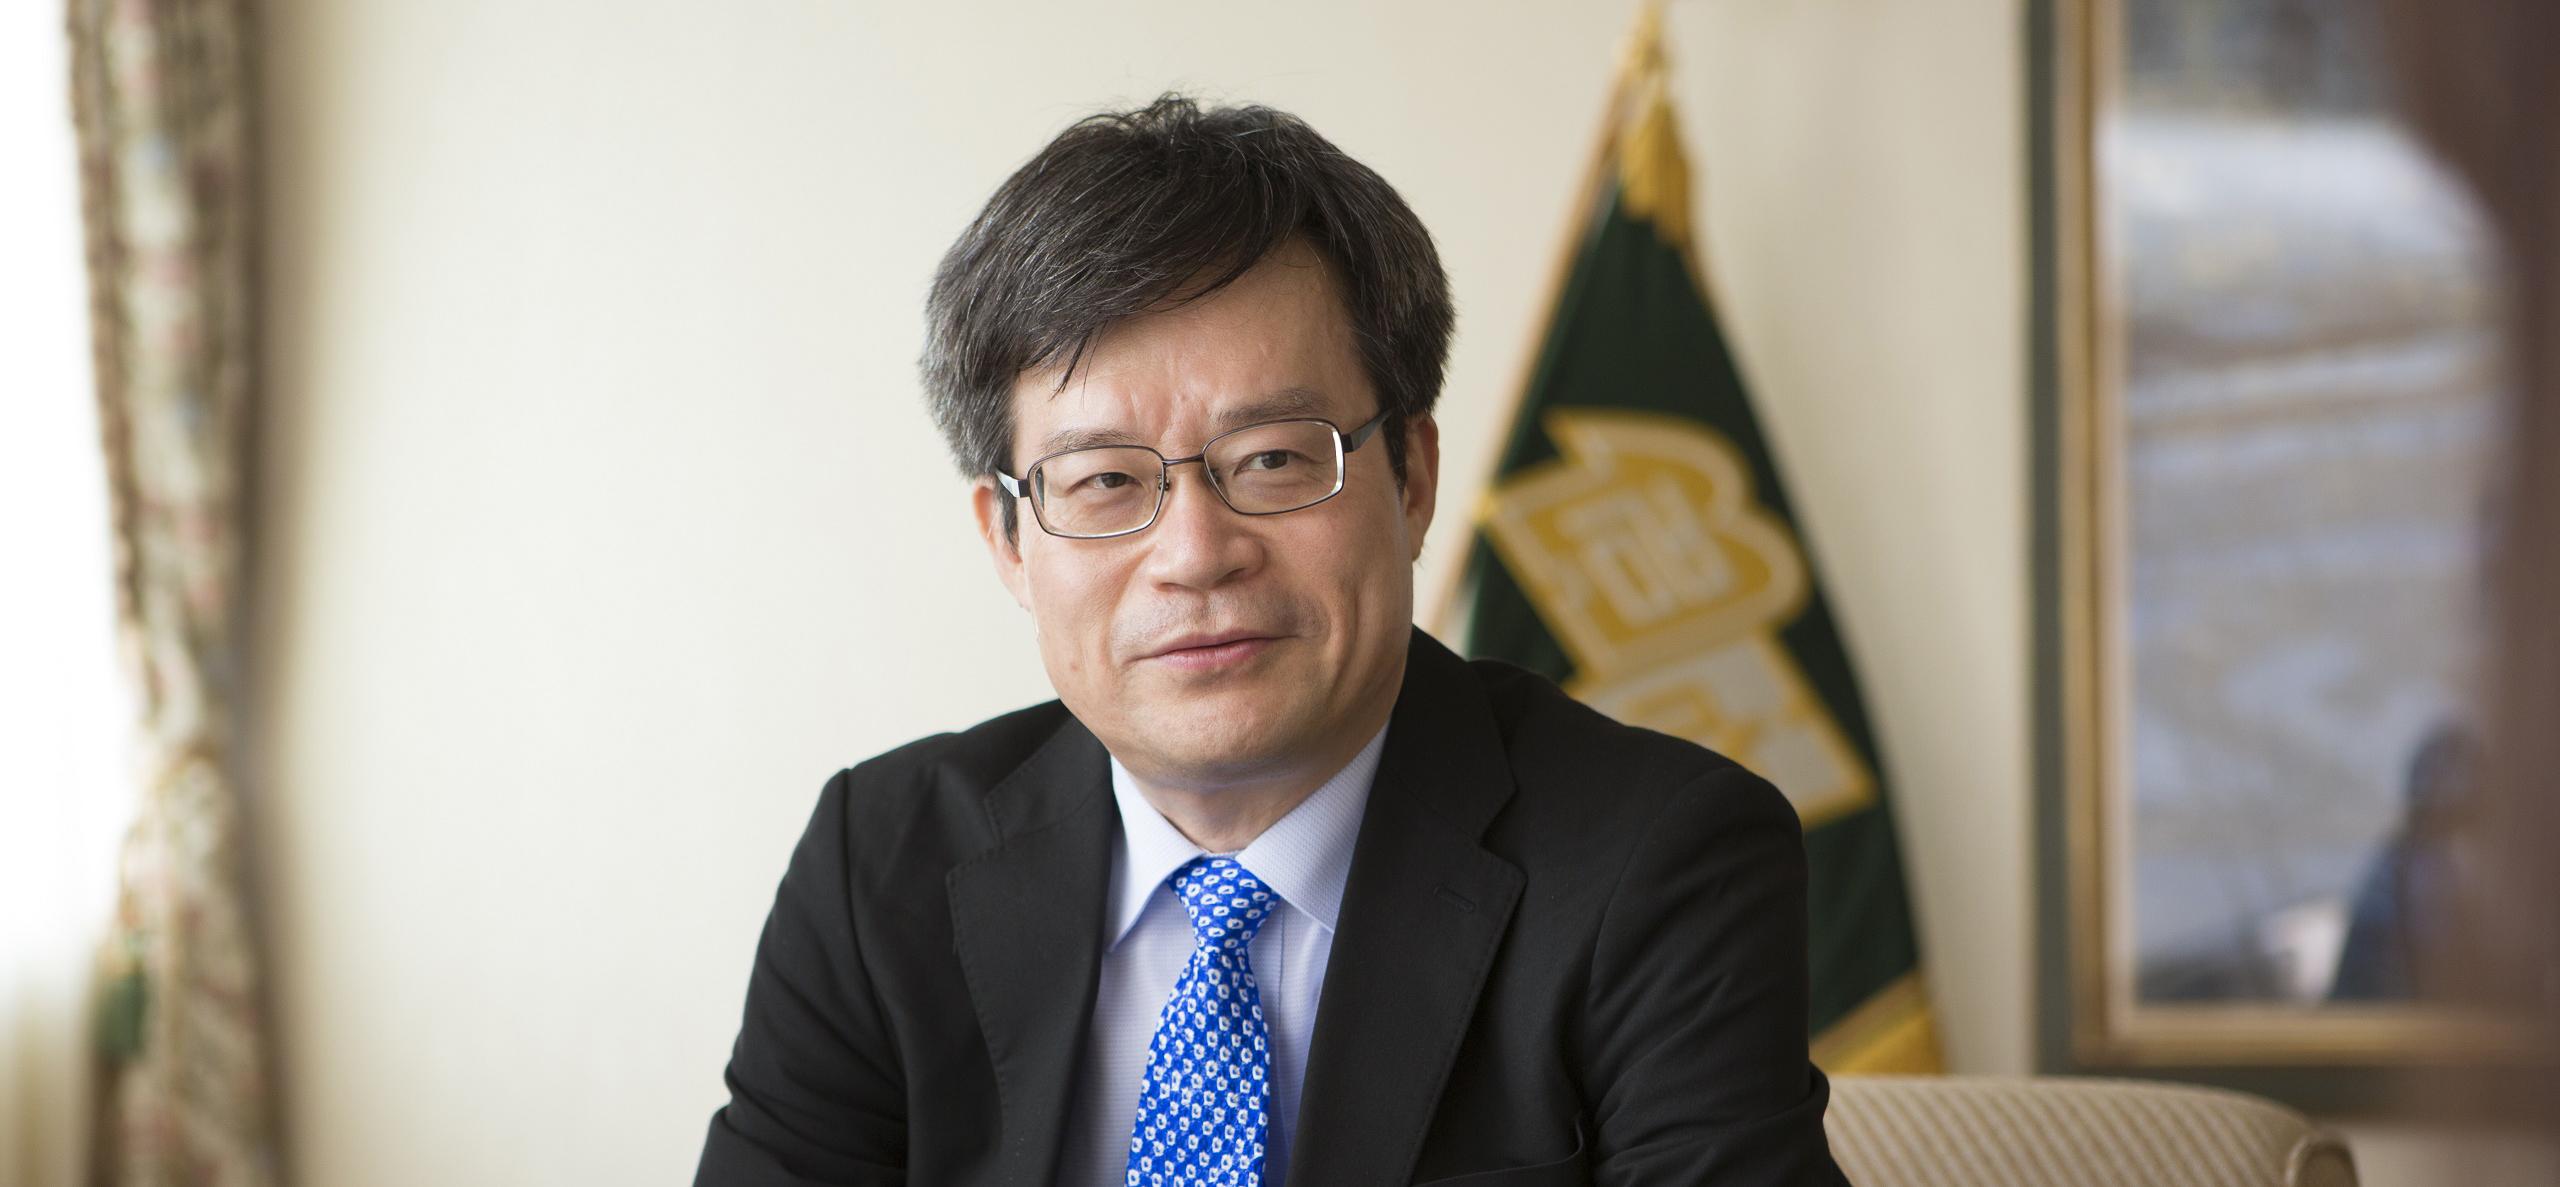 Hiroshi Amano, prix Nobel de physique 2014 ©Nagoya University